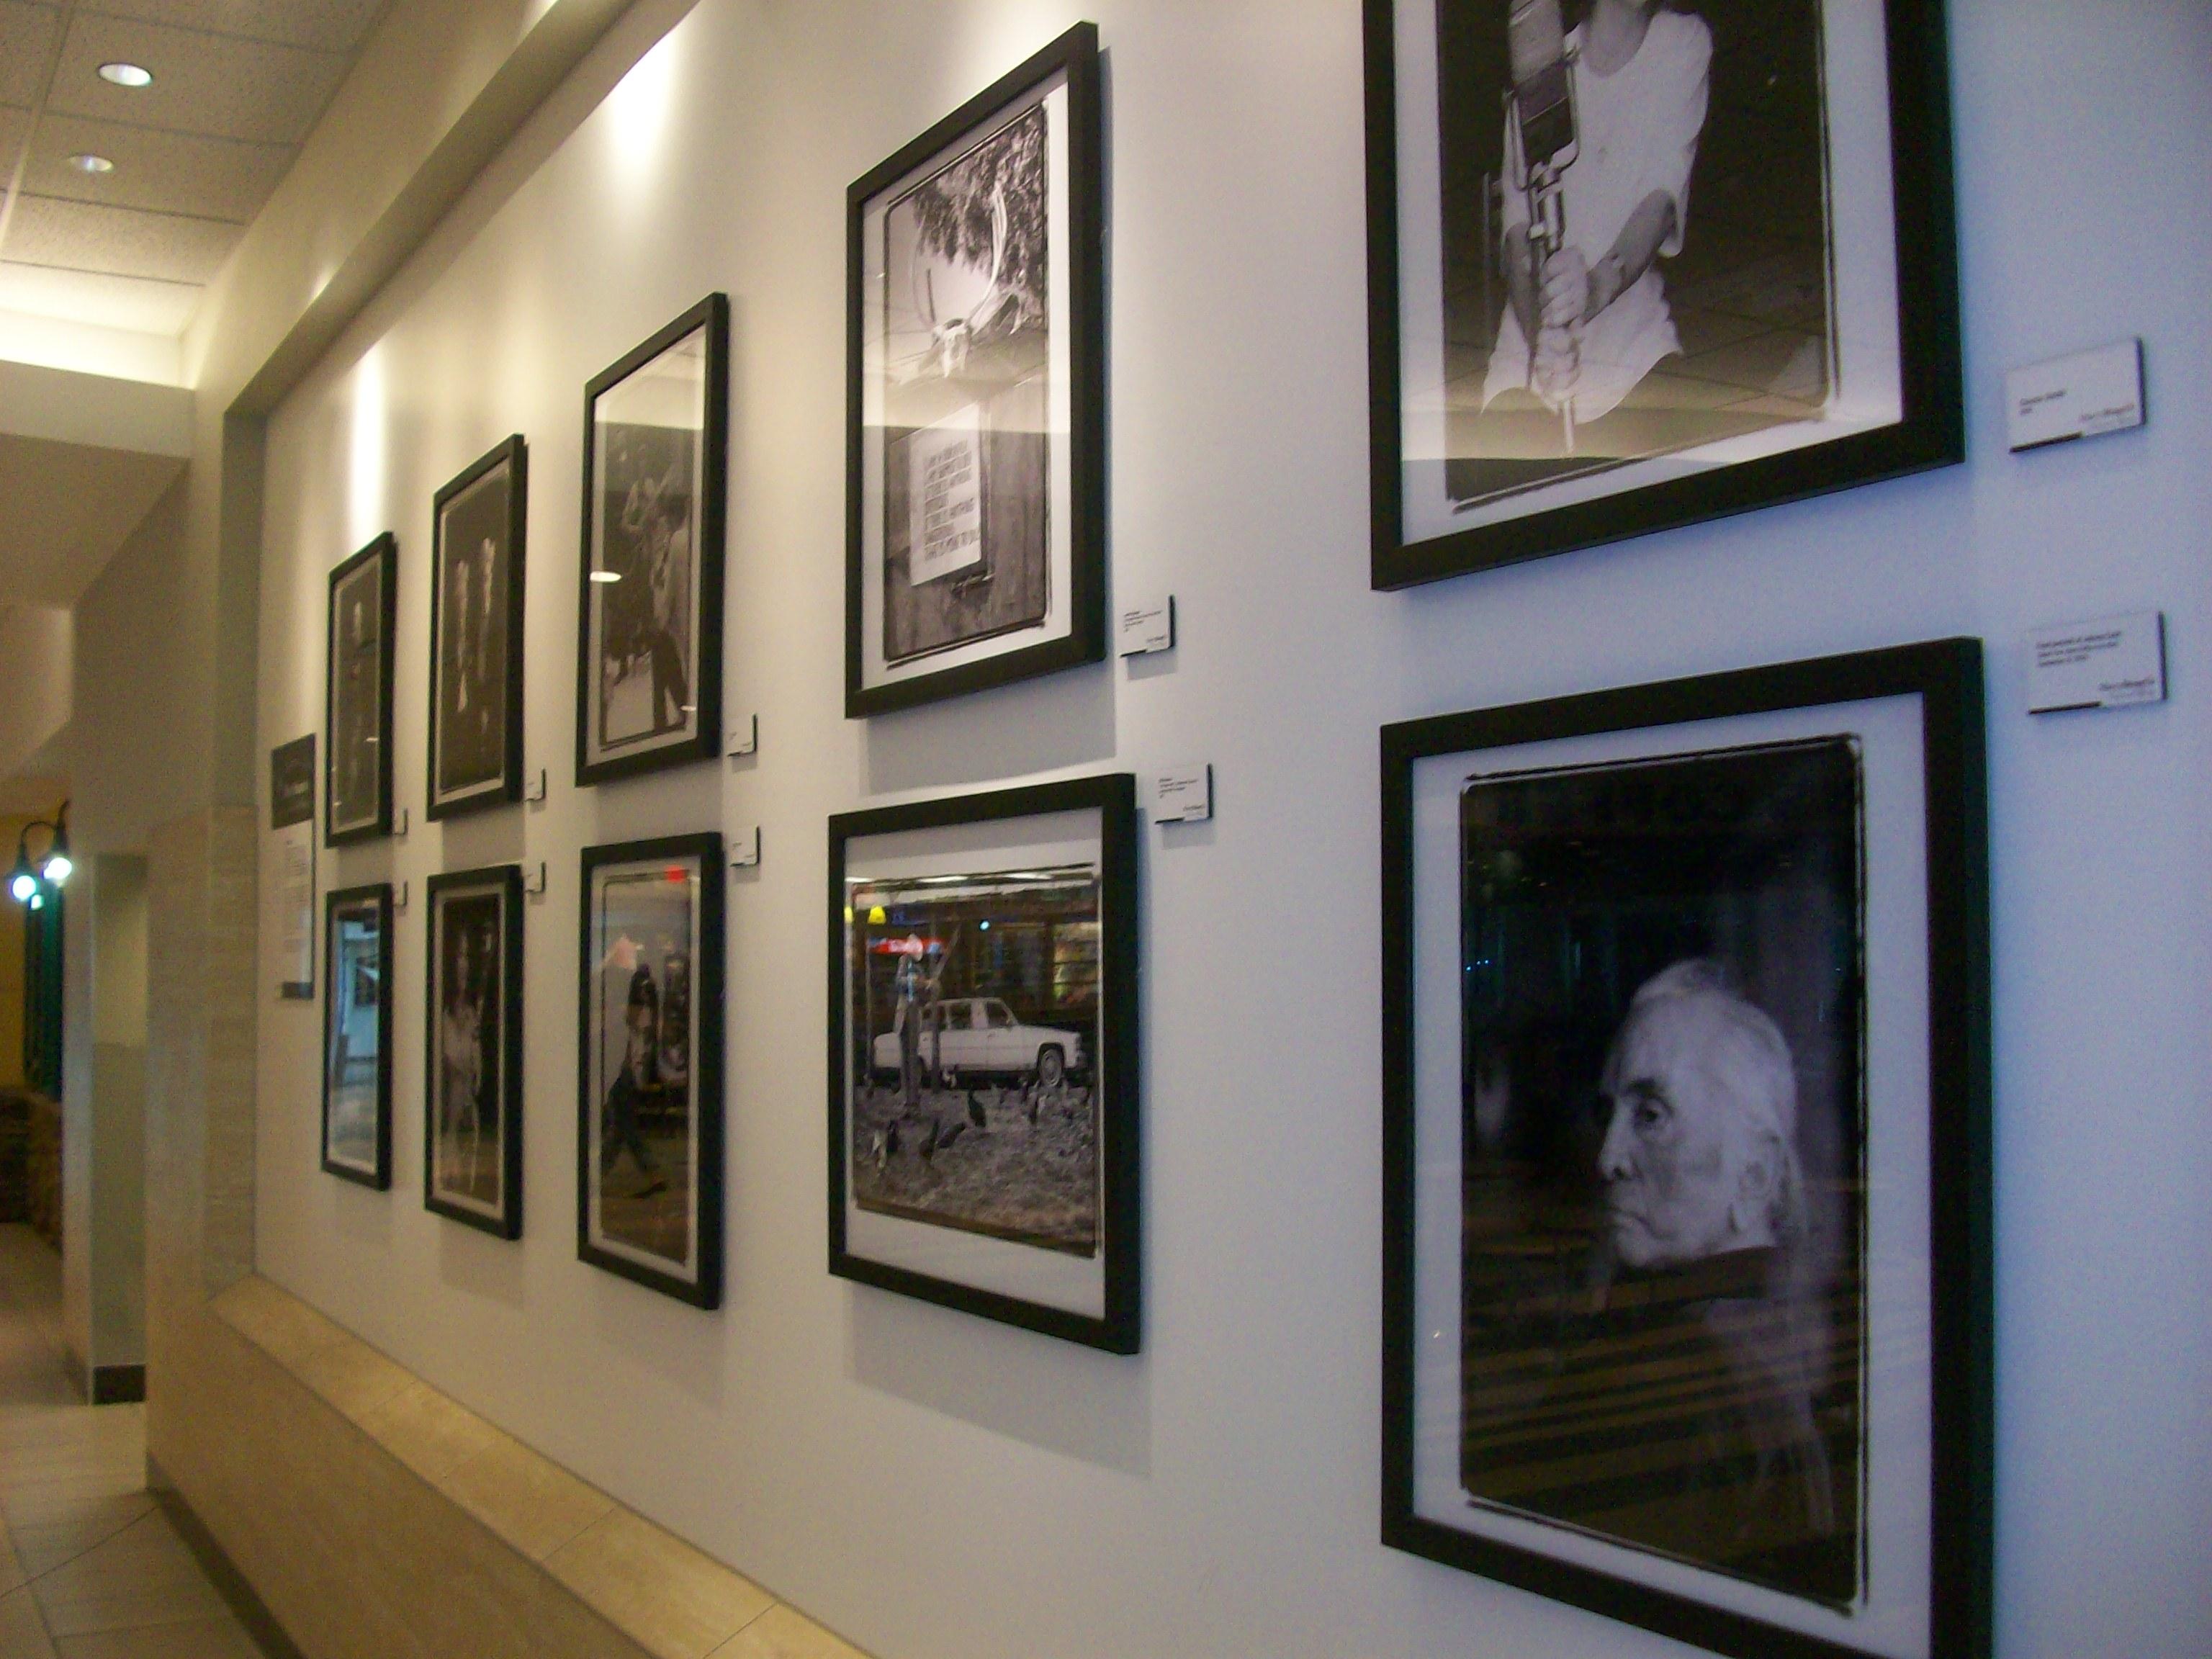 Portraits by Marty Stuart